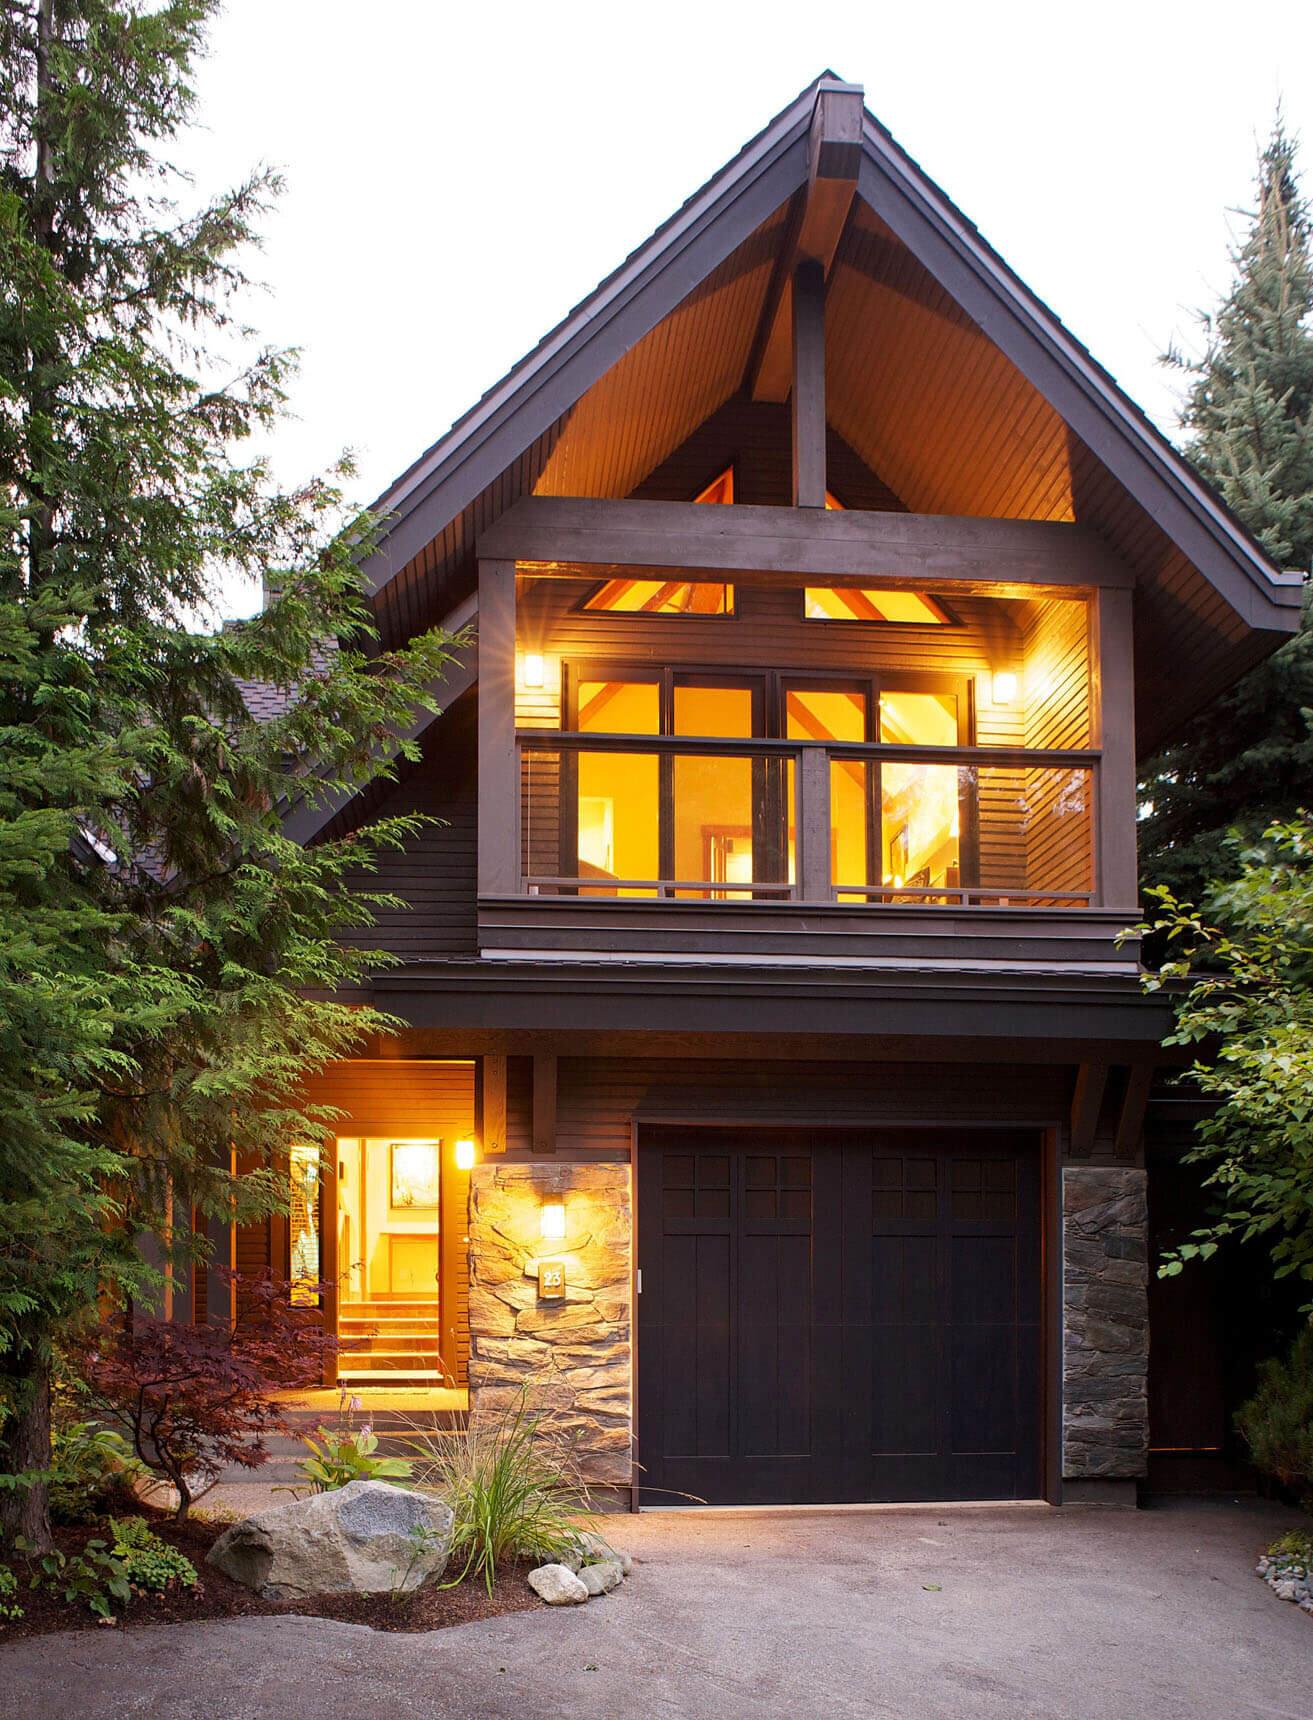 wsi-imageoptim-Front-forested-wood-home.jpg